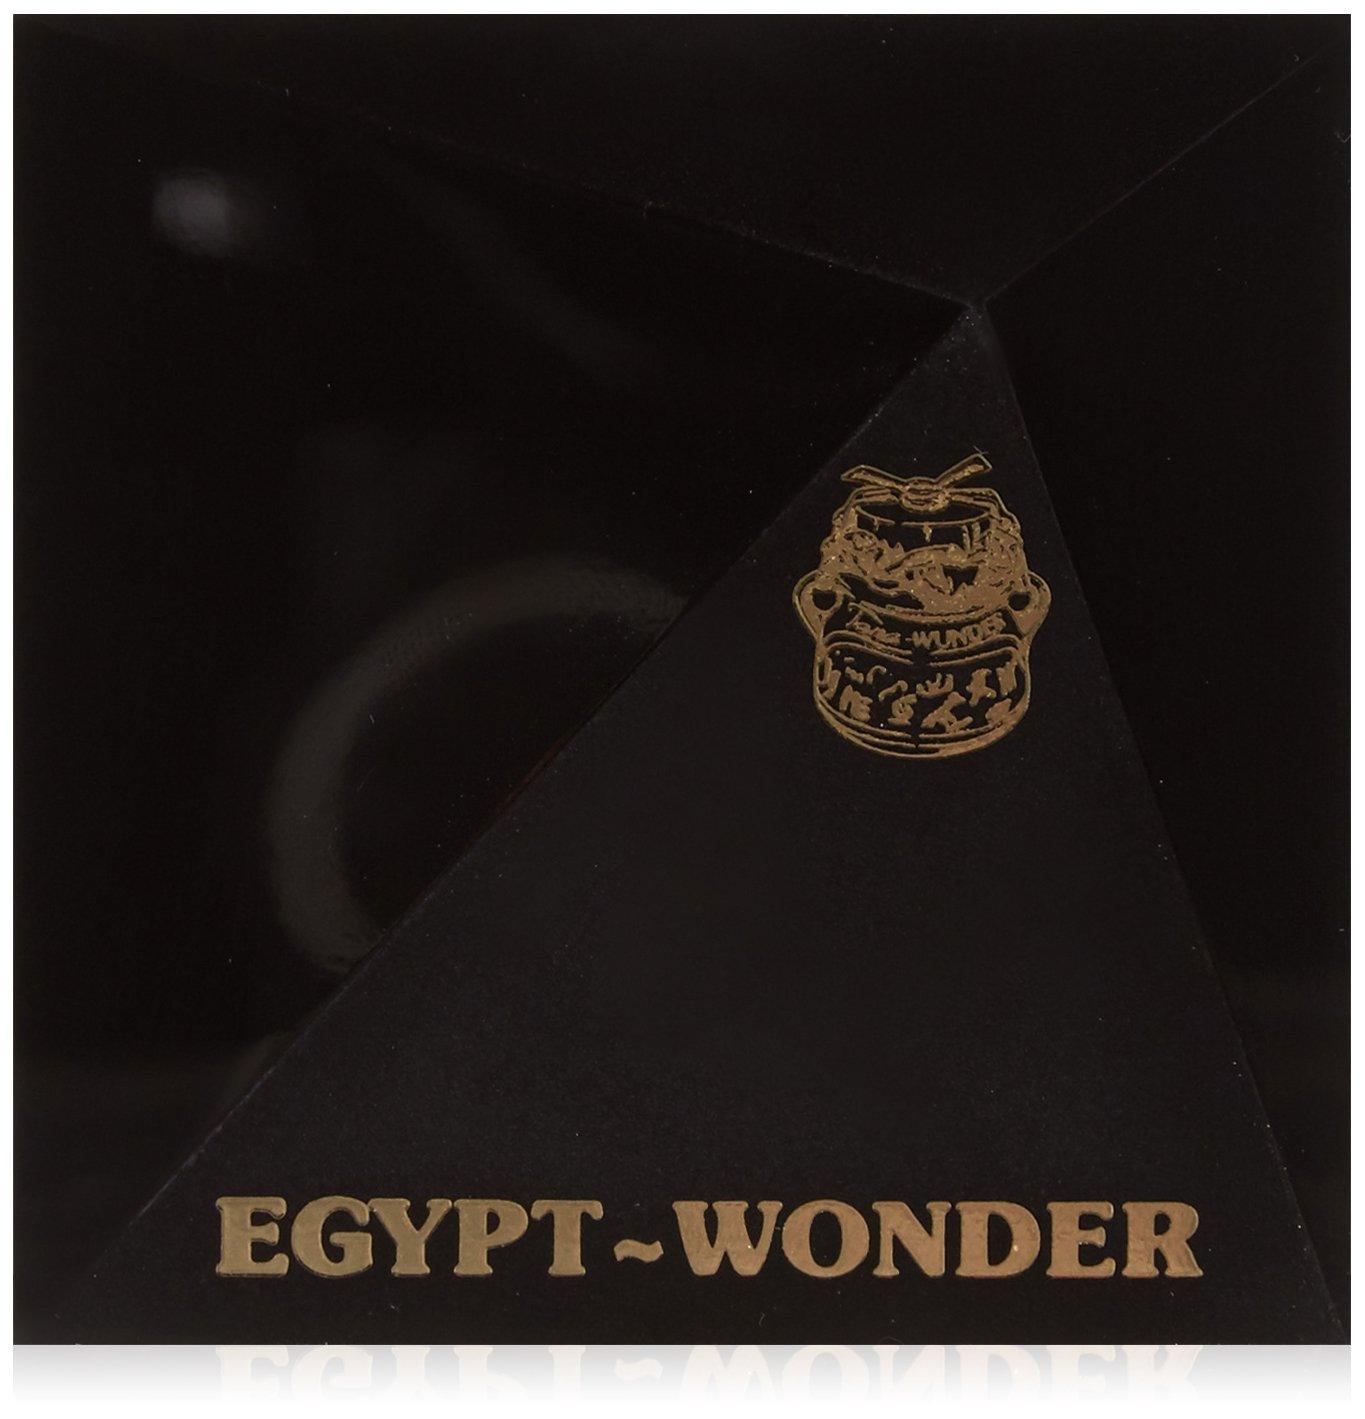 Tana Egypt-Wonder Compact Single matt, 1er Pack 8103